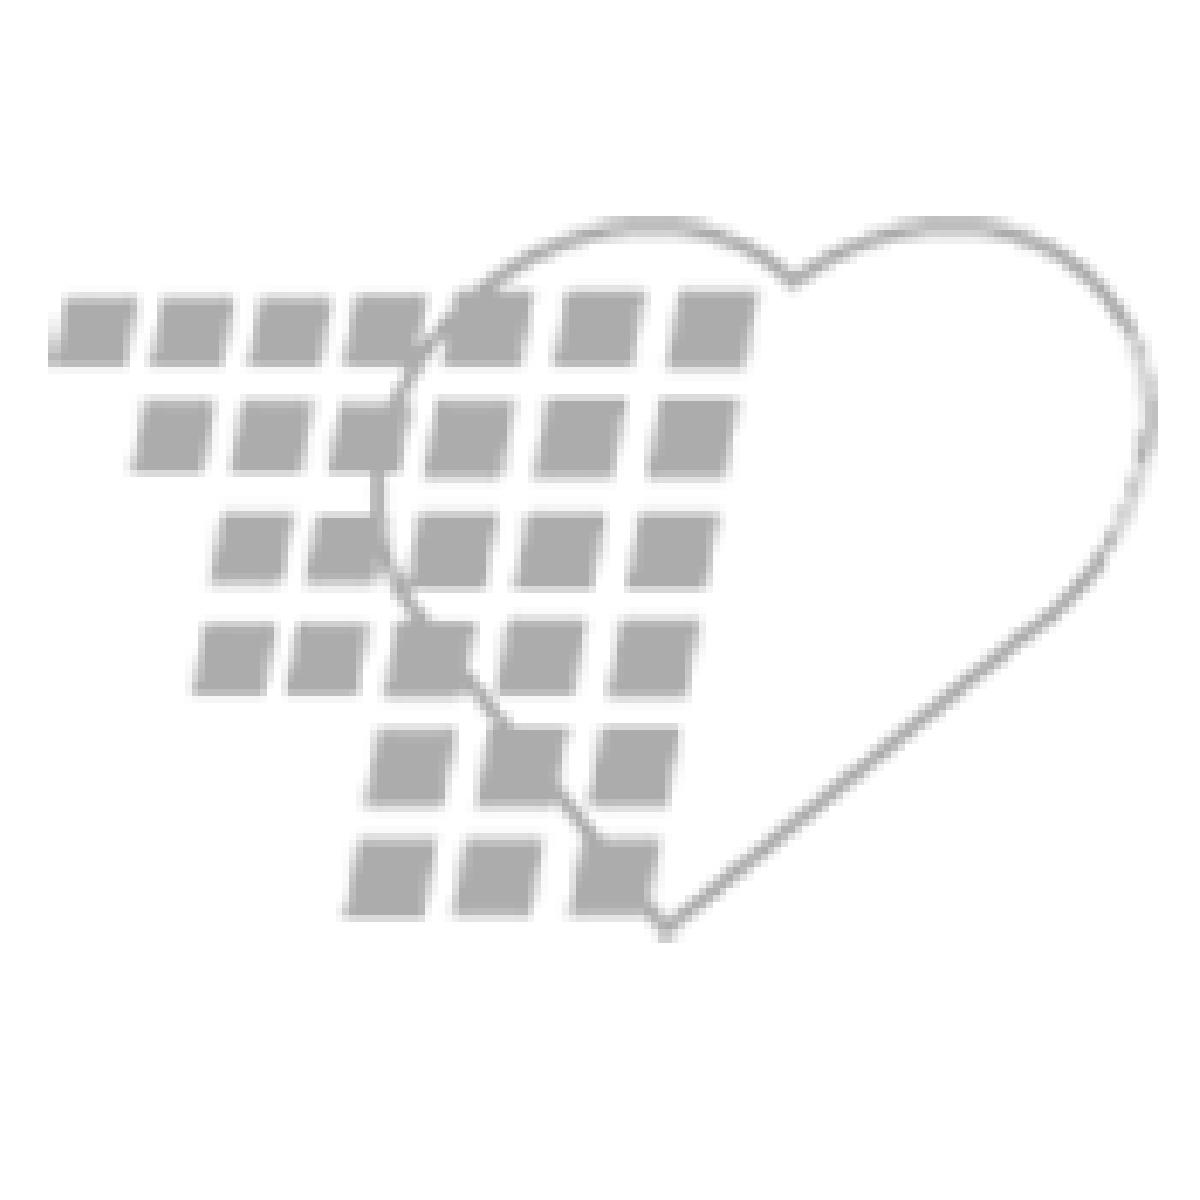 06-93-9021 - Demo Dose® Dilaudd (HYDROmorphon) 1mL Mini Vial 2mg/mL